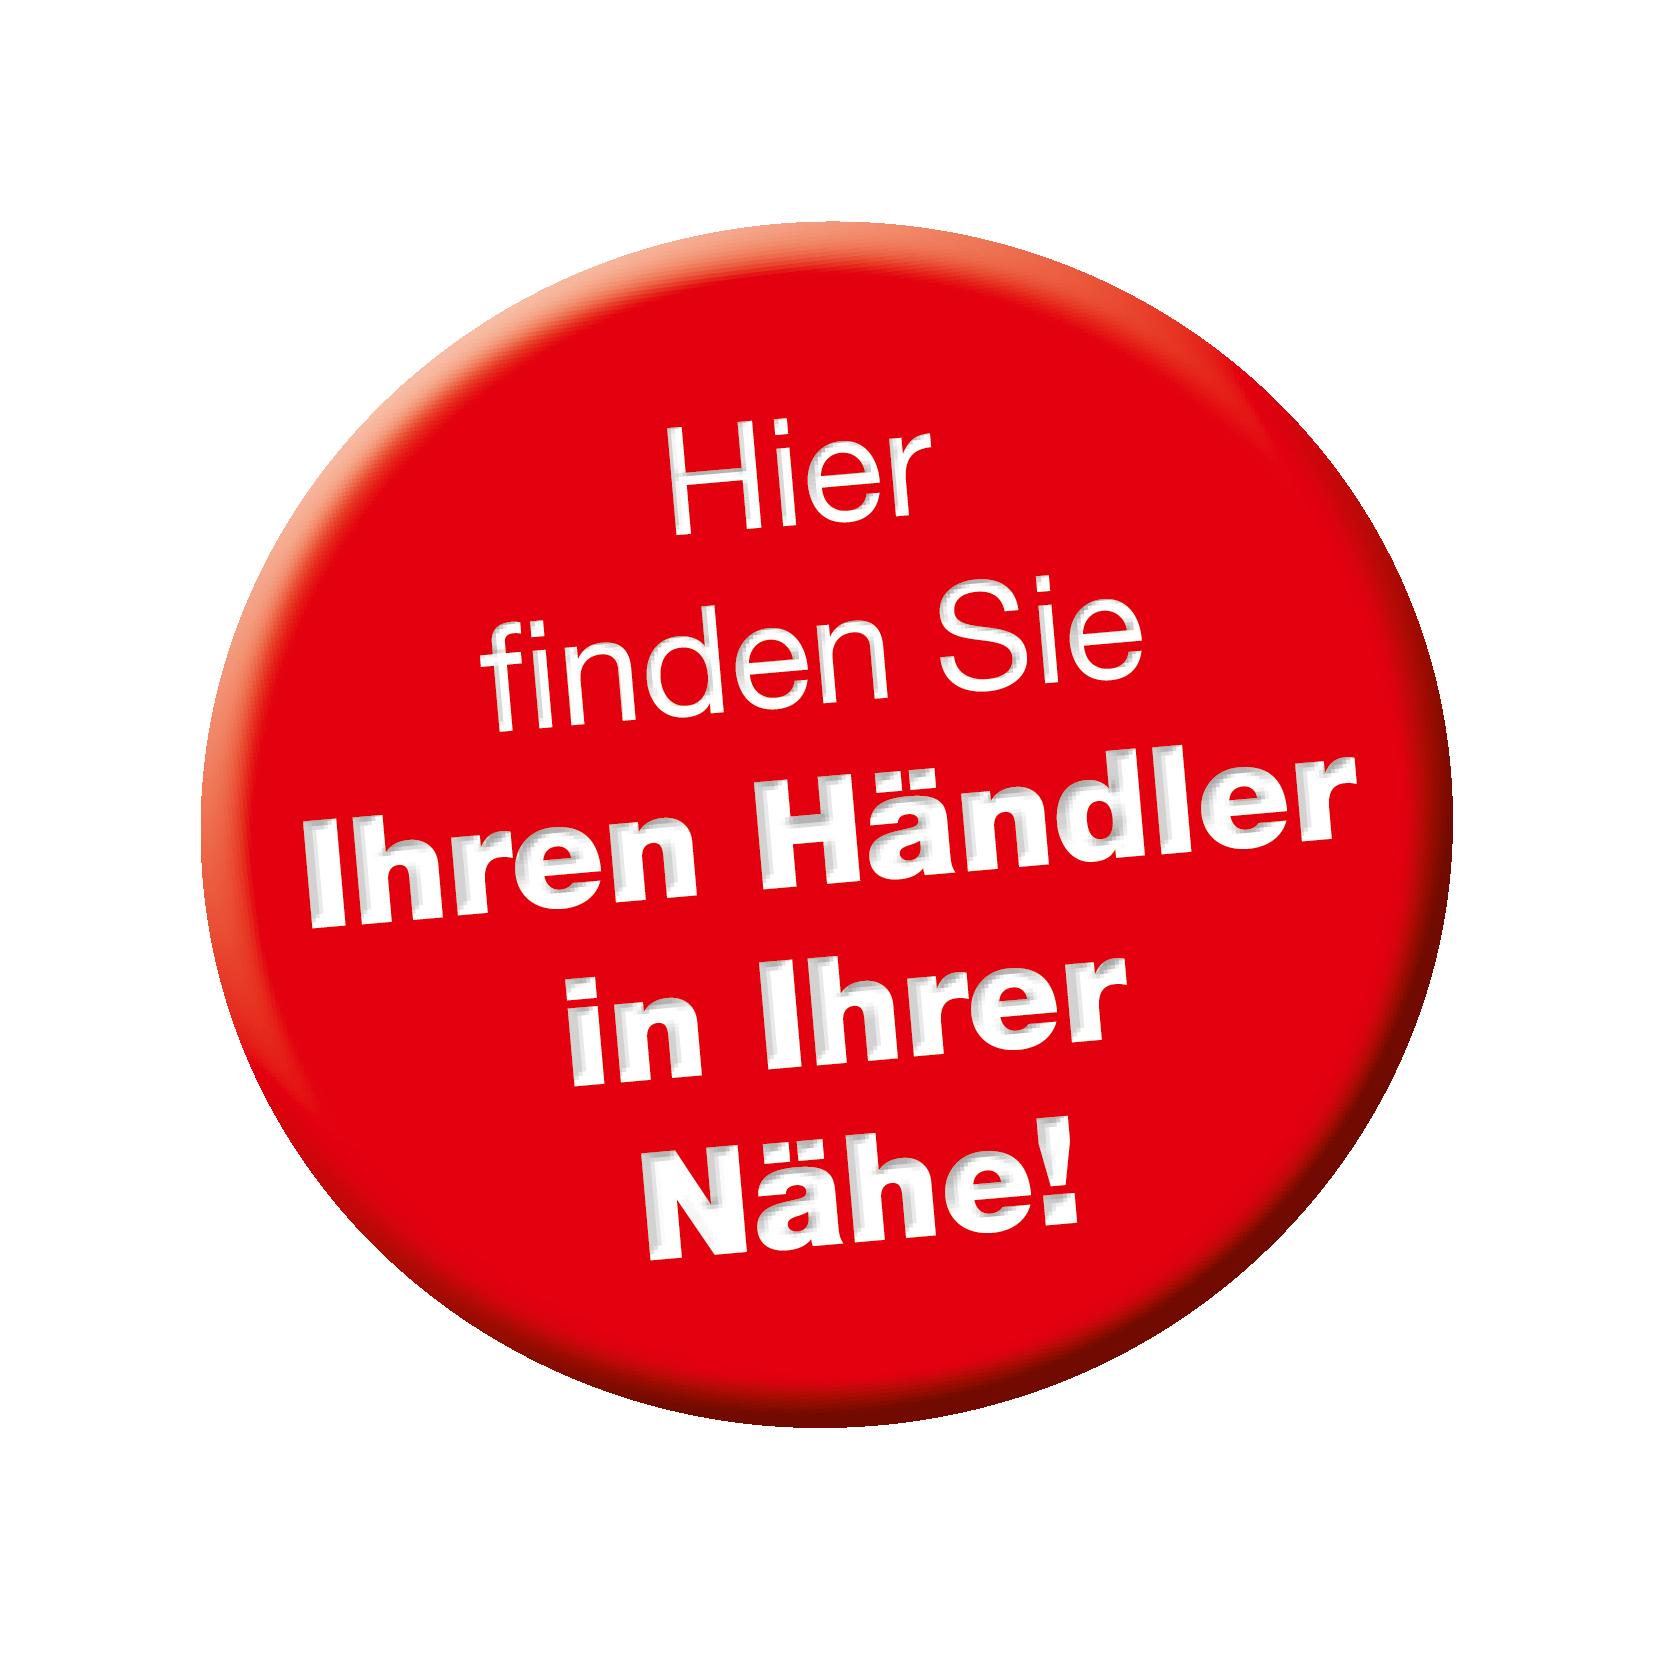 haendler button